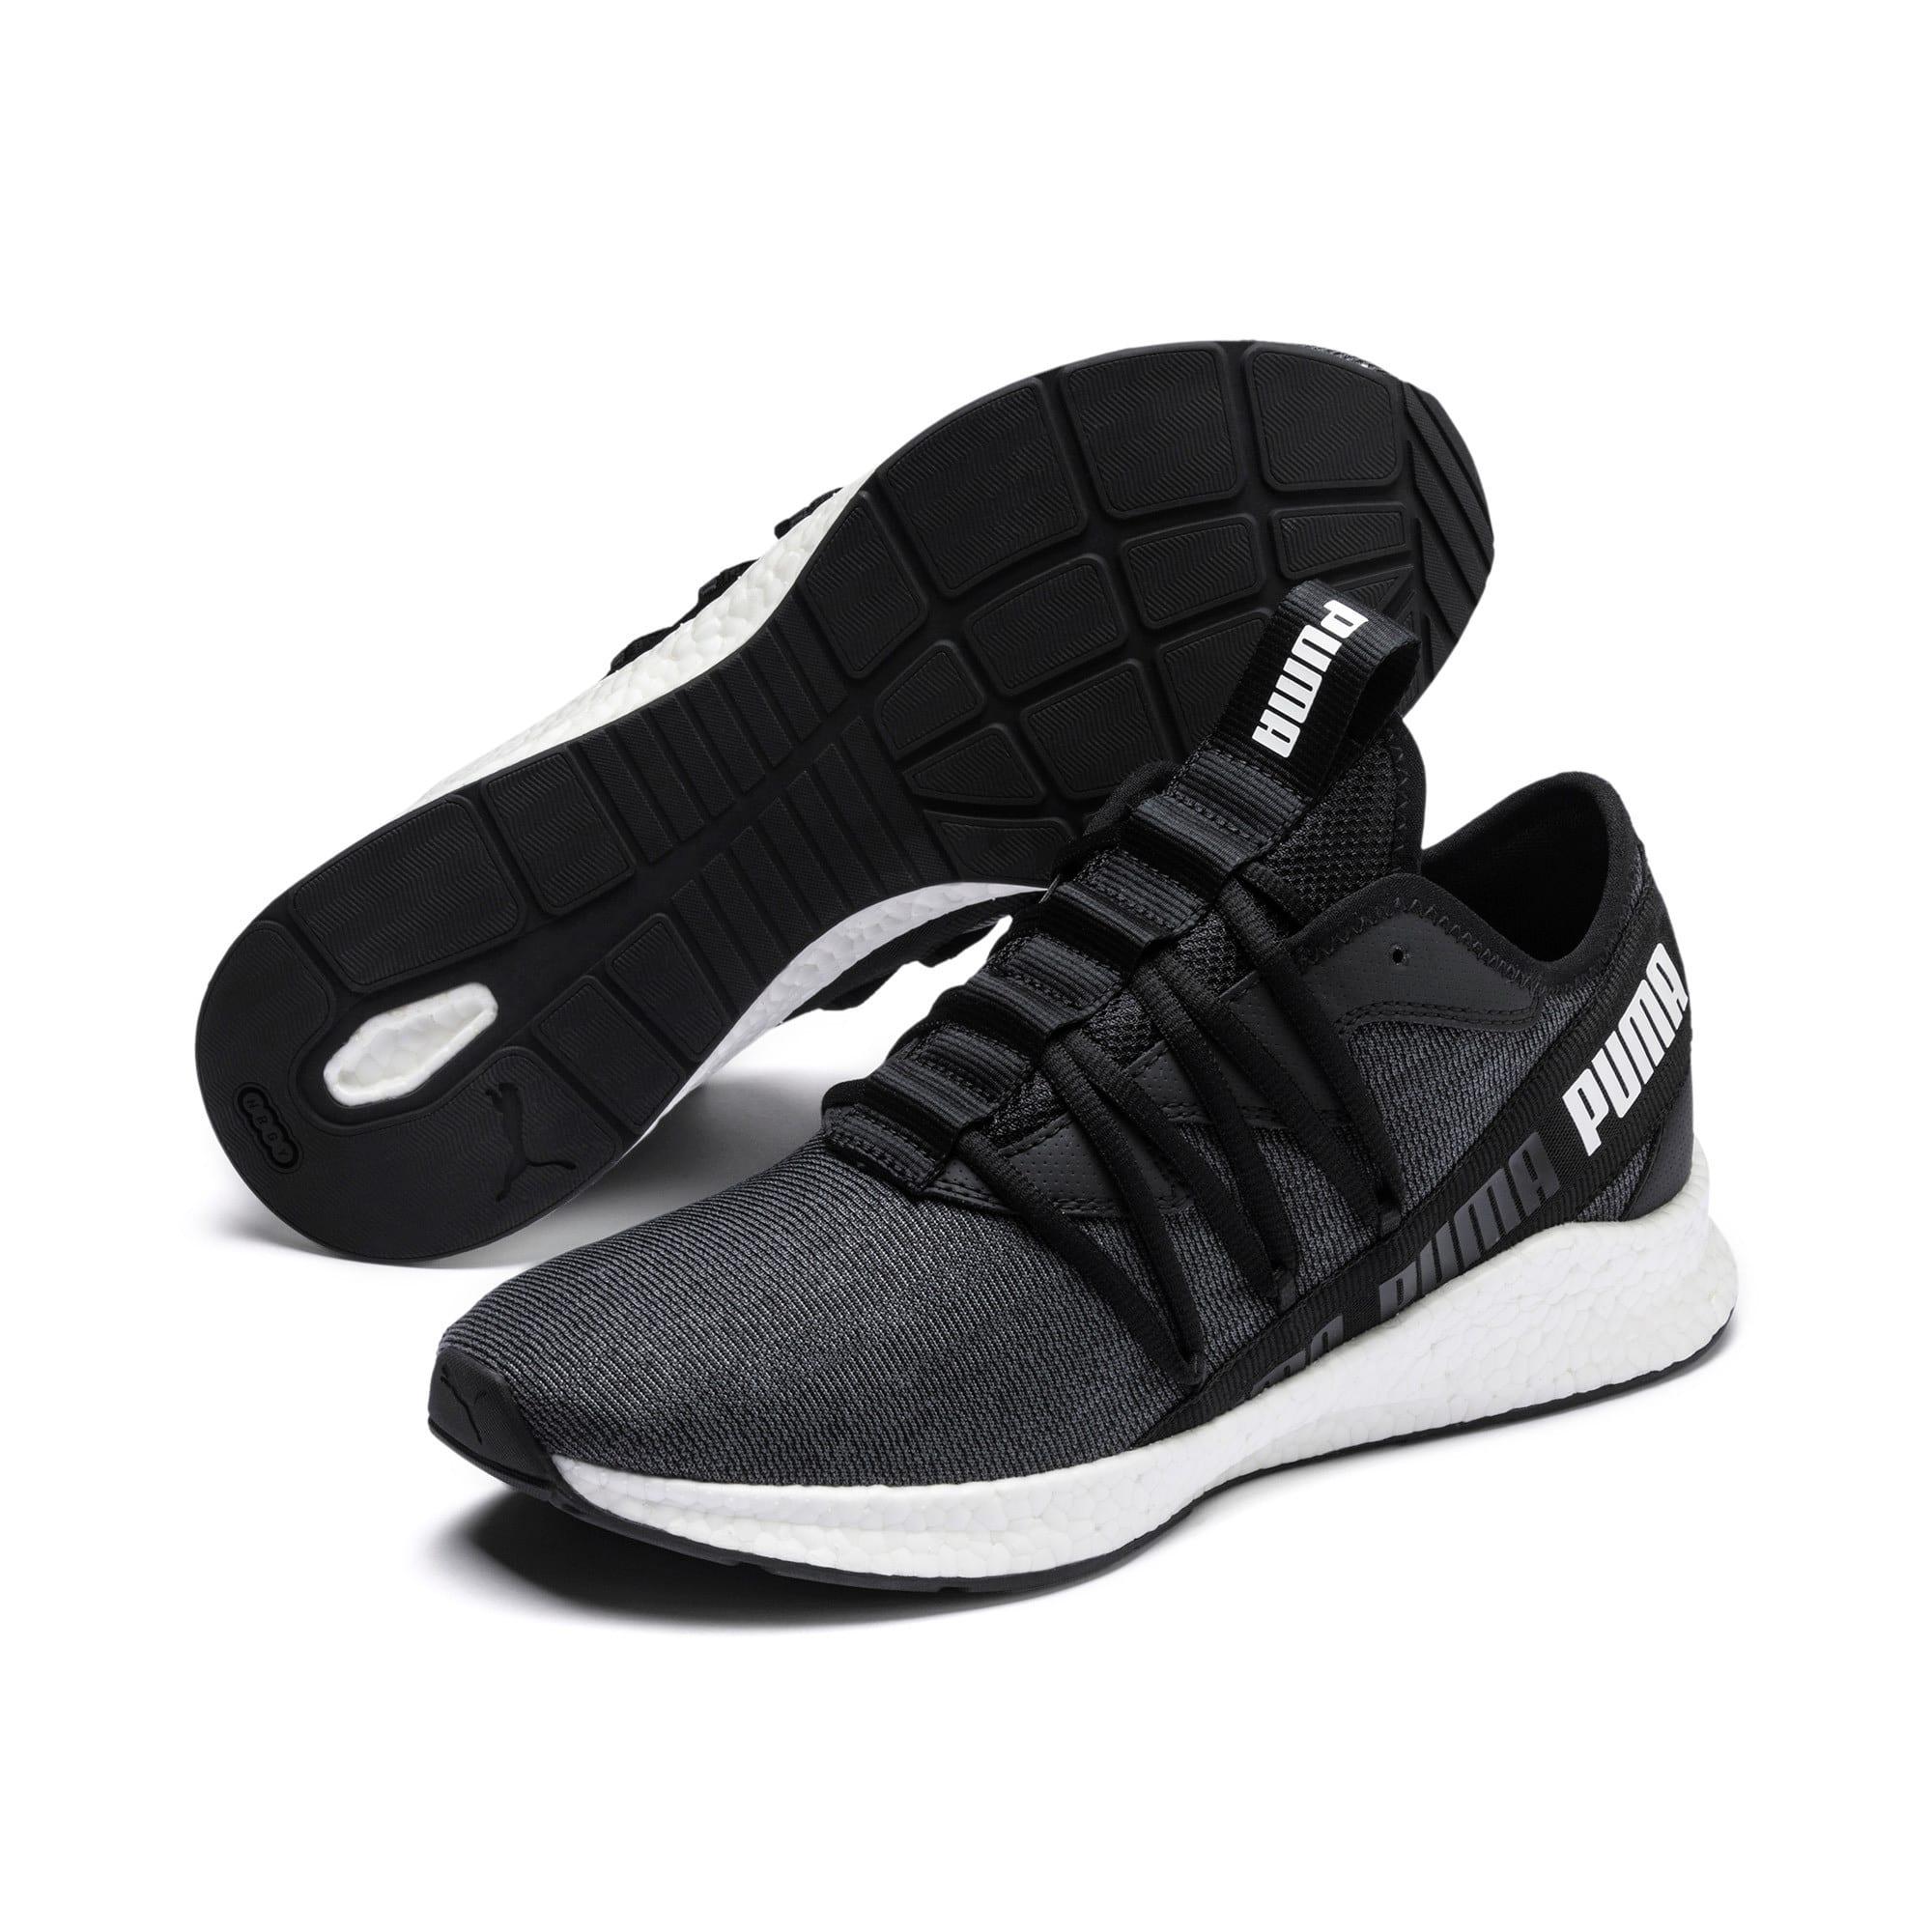 Thumbnail 3 of NRGY Star Knit Running Shoes, Puma Black-Puma White, medium